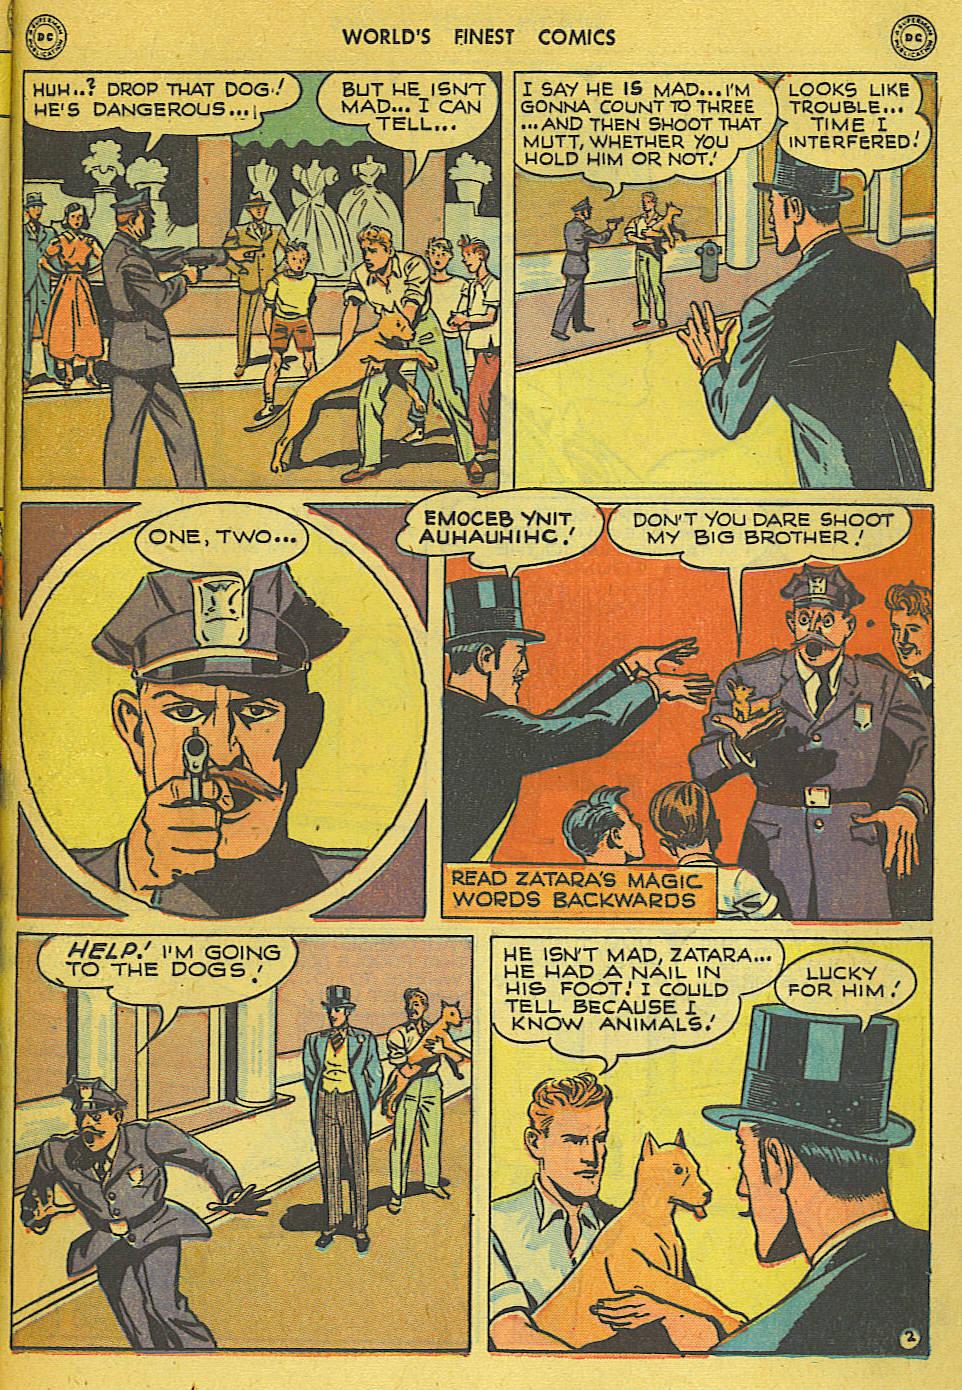 Read online World's Finest Comics comic -  Issue #34 - 55